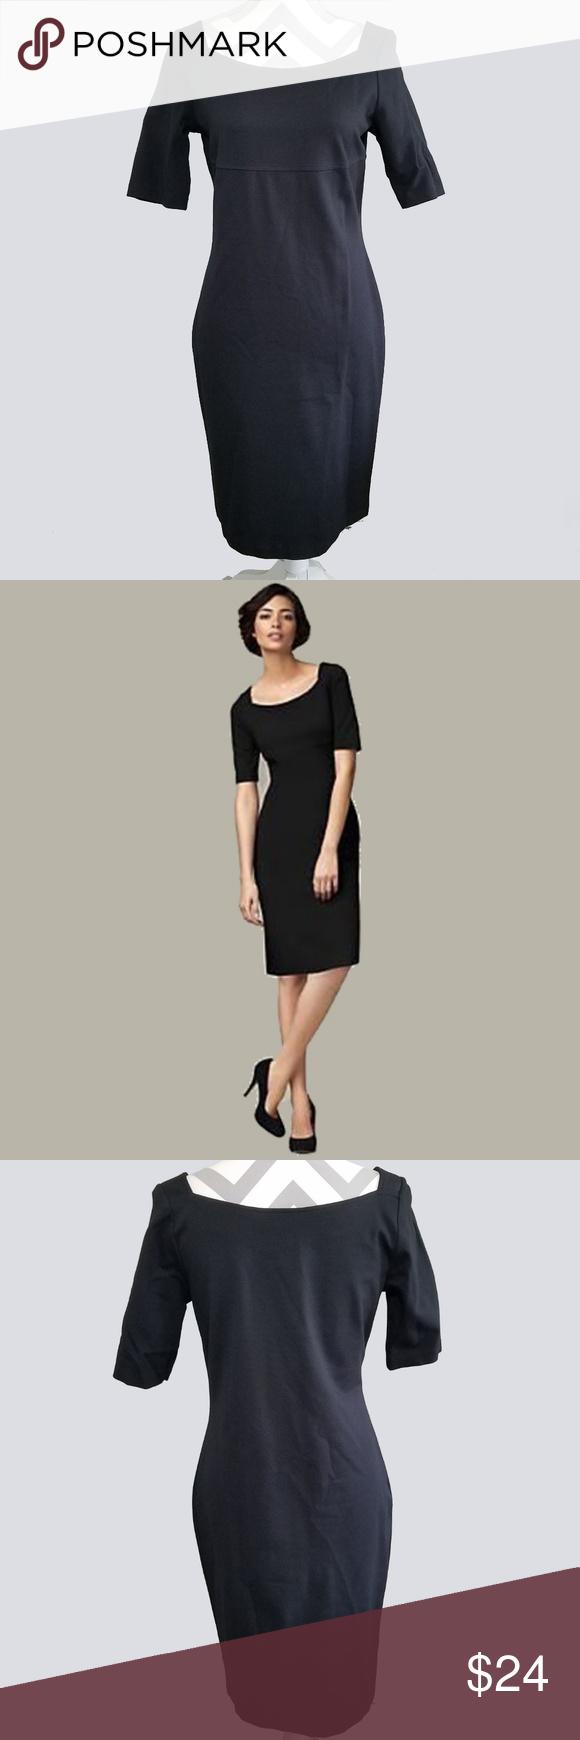 The New Little Black Dress Classic Black Dress Outfit Dresses Classic Black Dress [ 1875 x 1440 Pixel ]